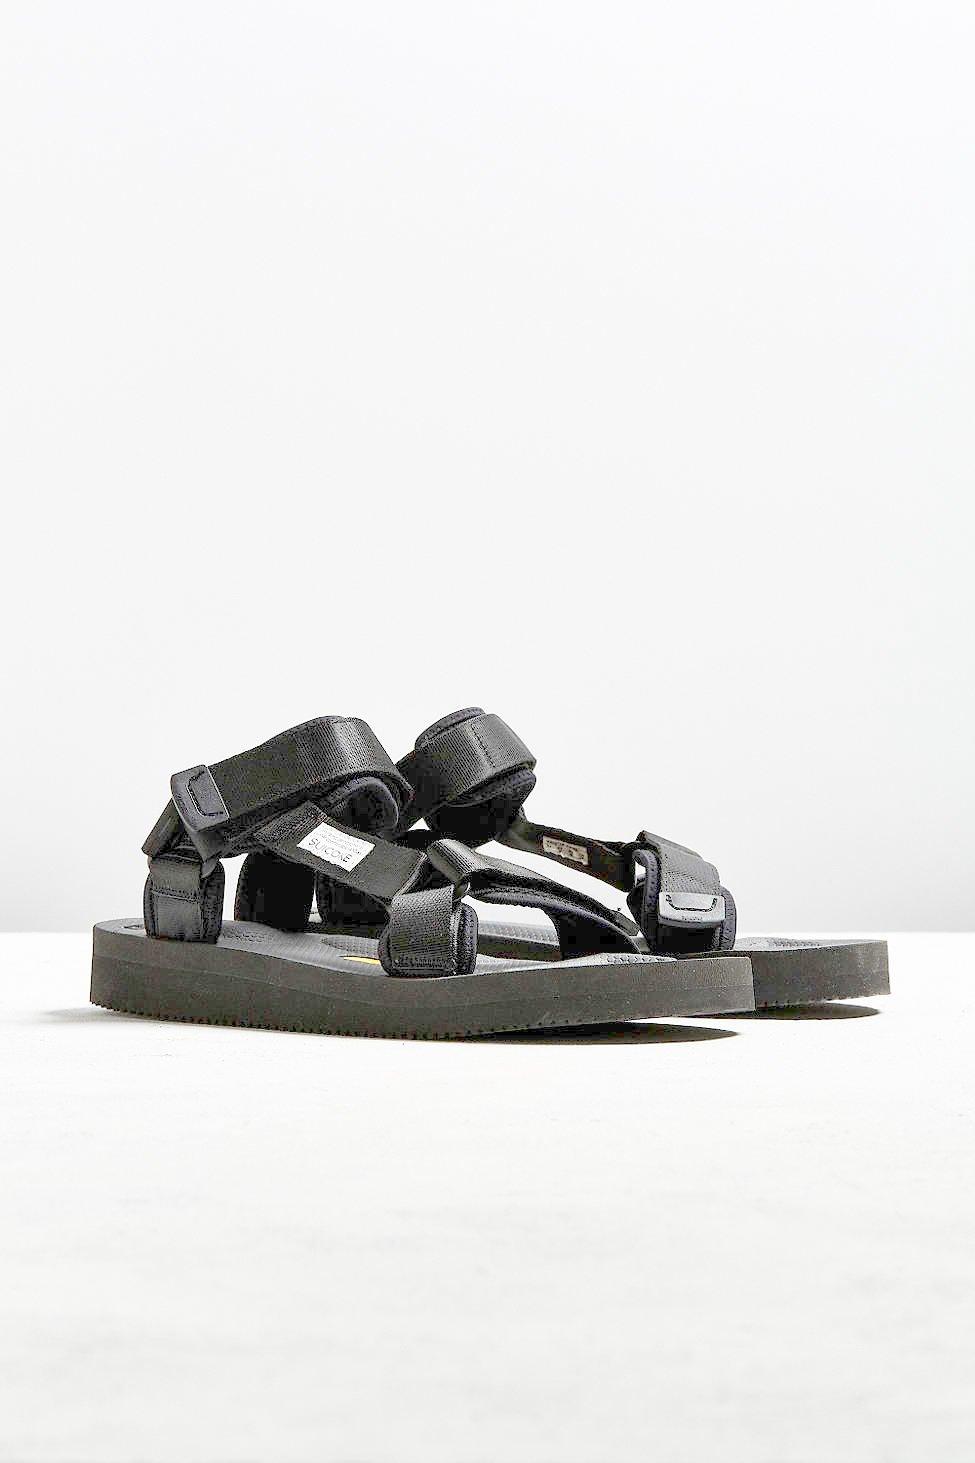 ee2575a1e310 Lyst - Suicoke Depa-v2 Sandal in Black for Men